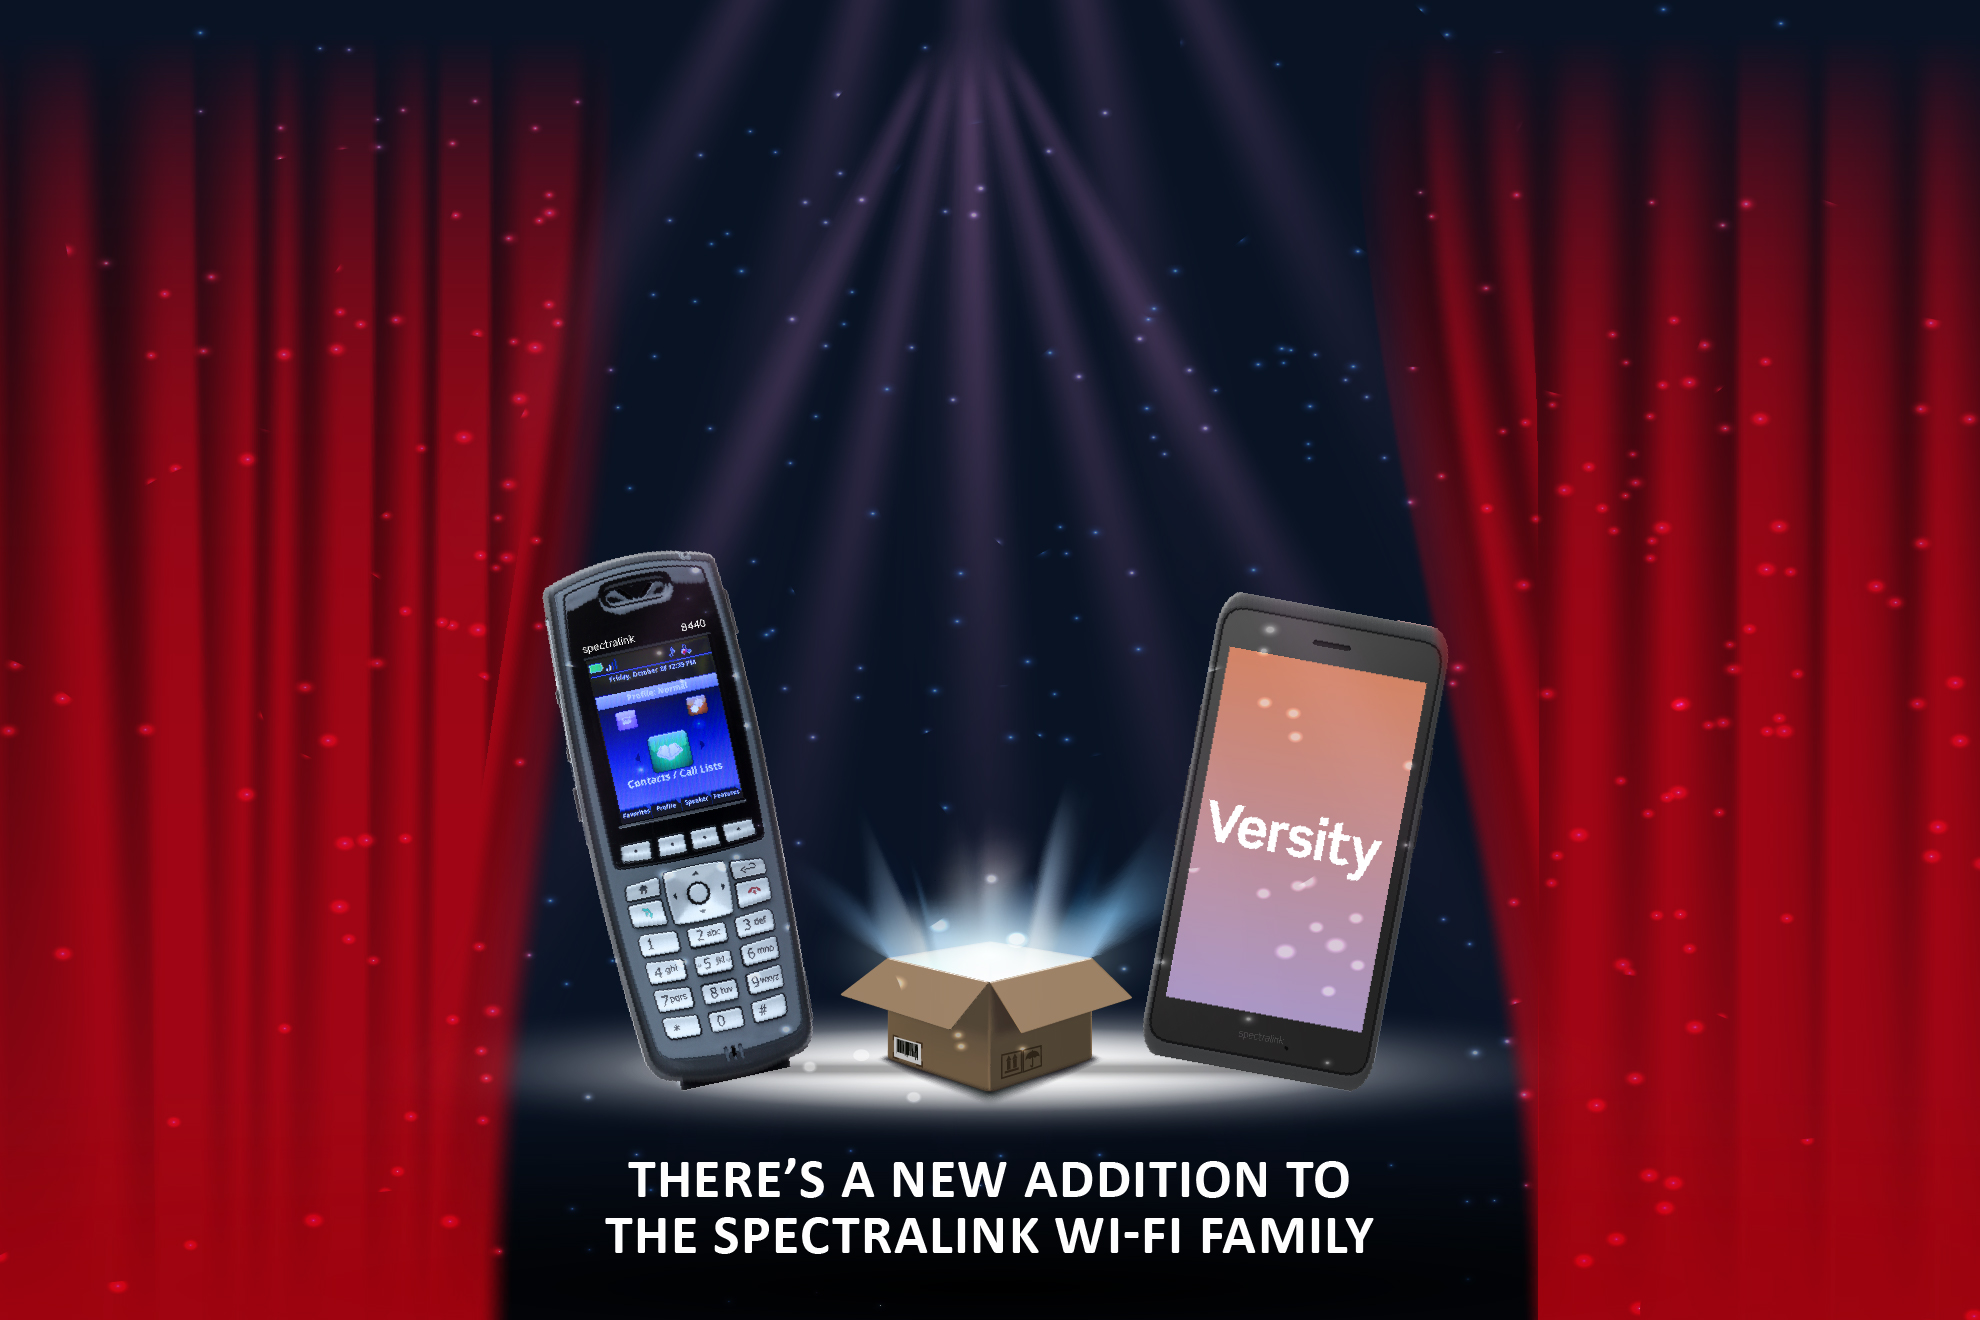 Spectralink Versity Wi-Fi Product Launch